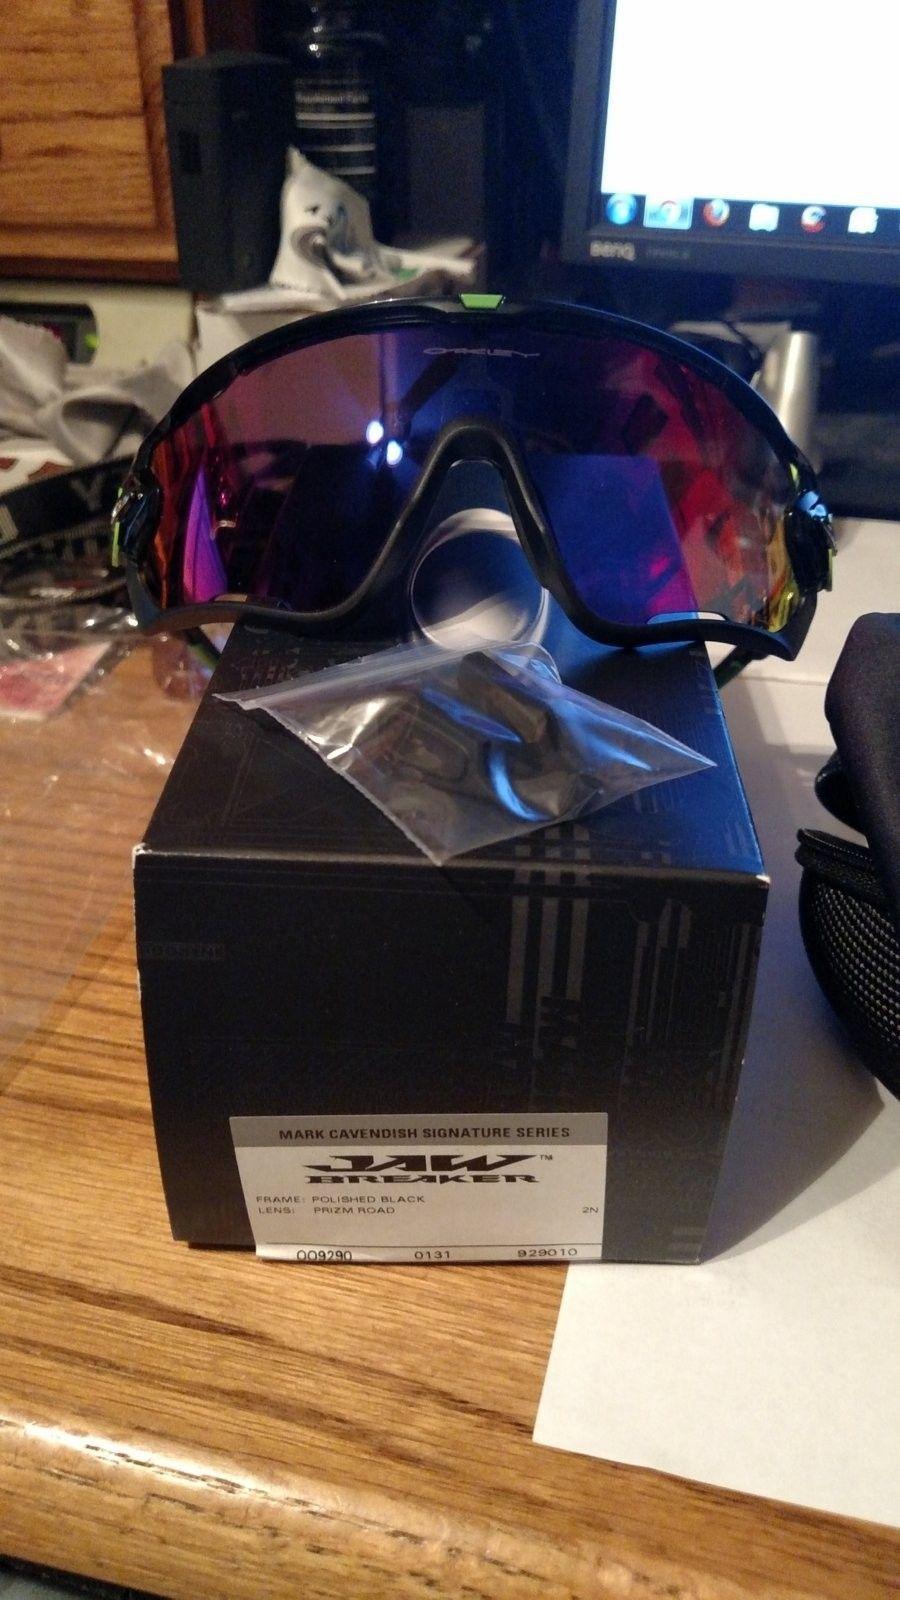 Jawbreaker Mark Cavendish Polished Black w/ Prizm Road oo9290-10 - IMG_20151130_143800947.jpg